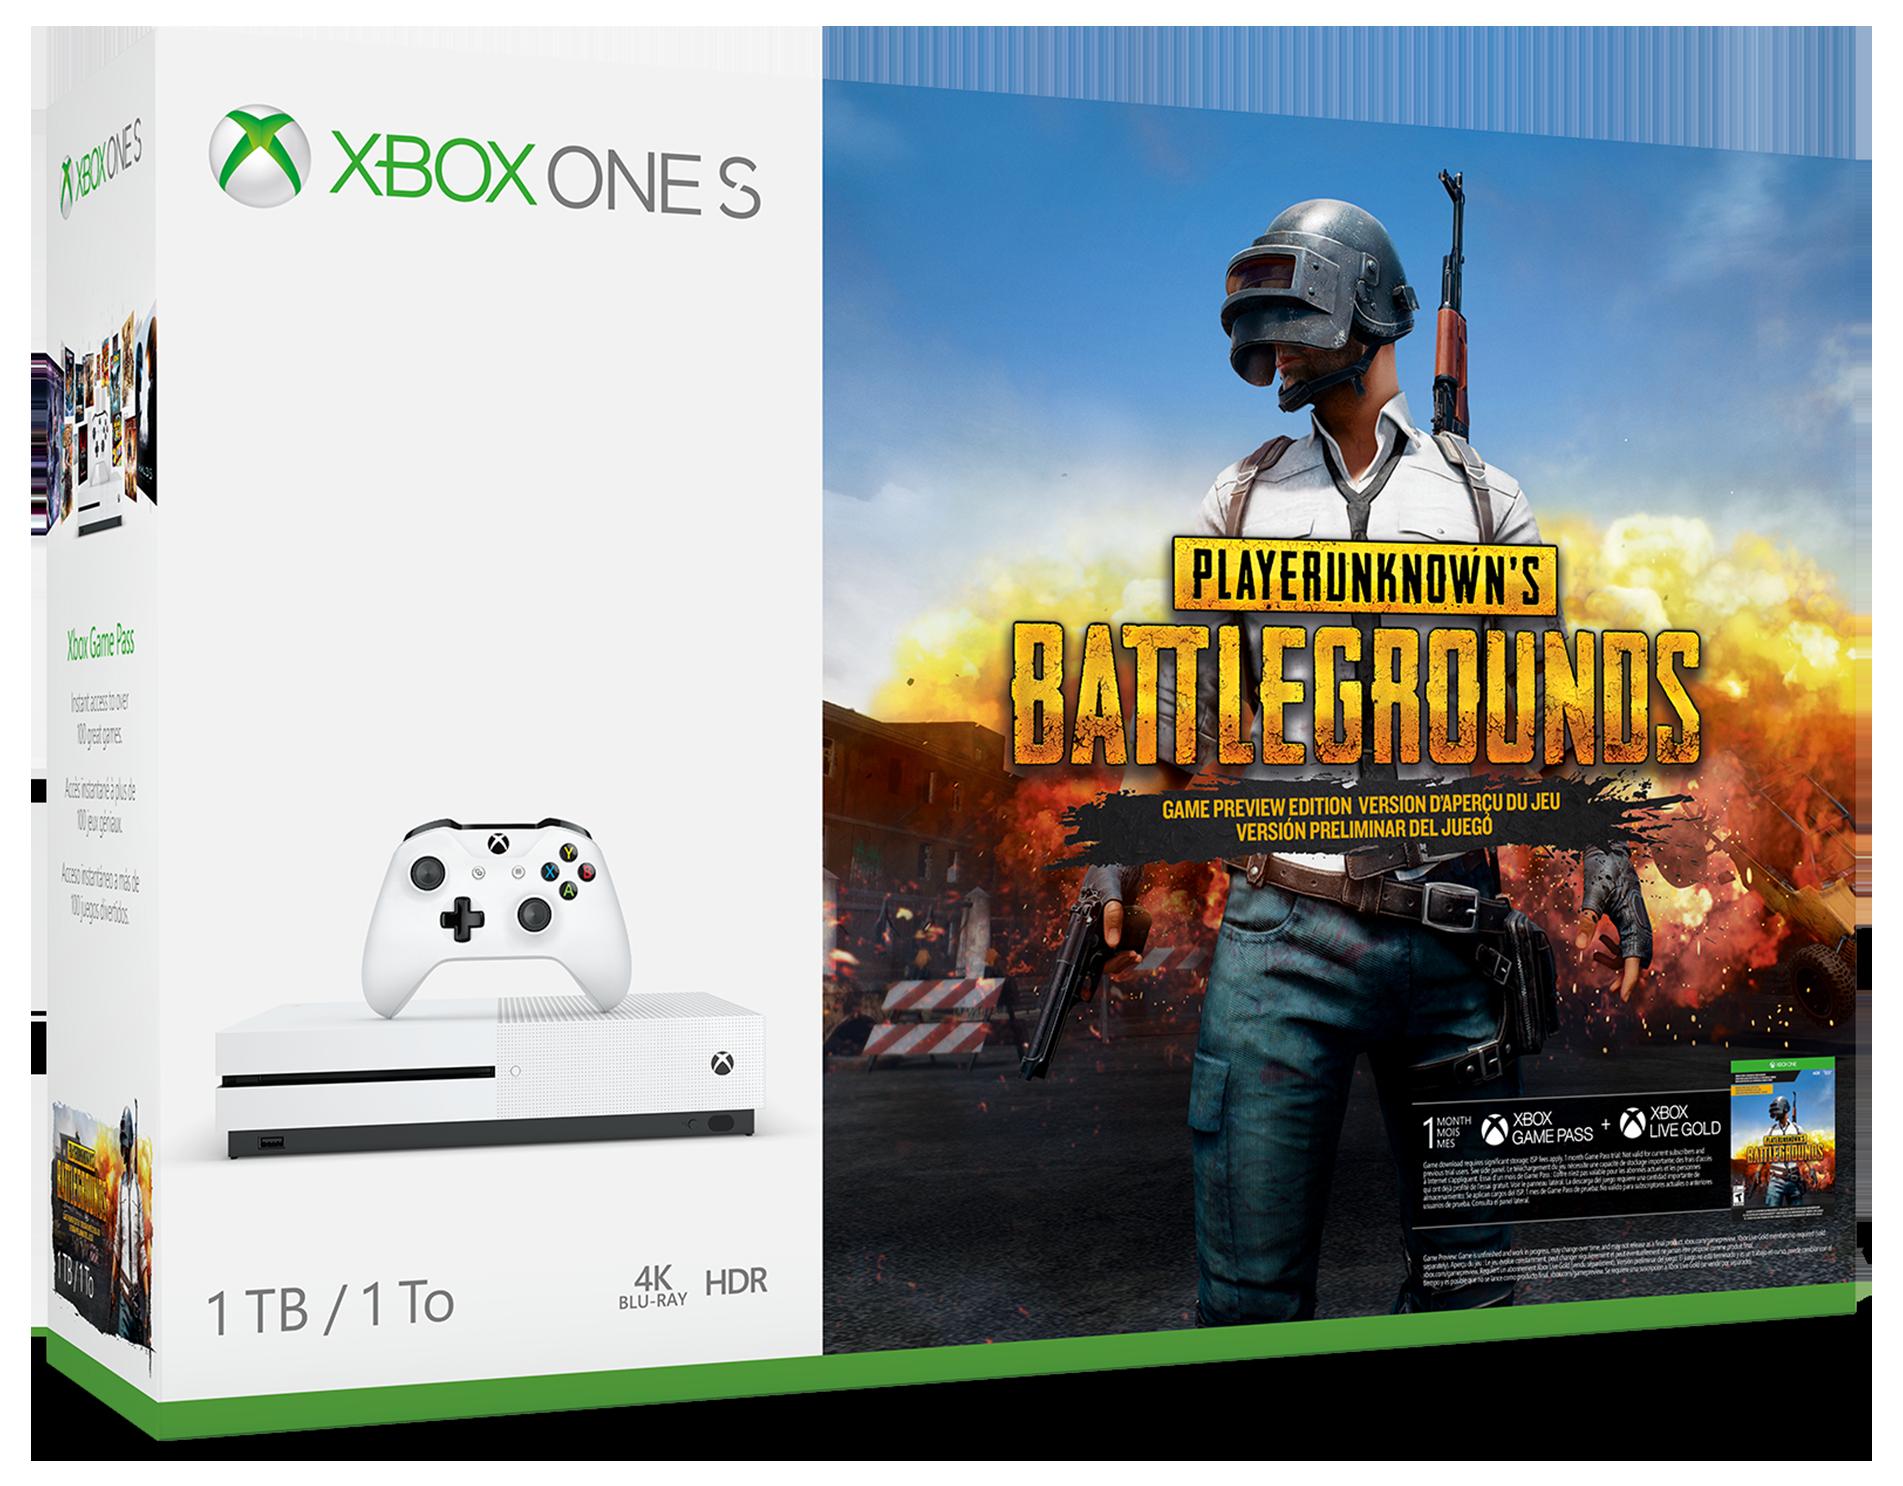 Xbox One S 1TB Console – PLAYERUNKNOWN'S BATTLEGROUNDS Bundle